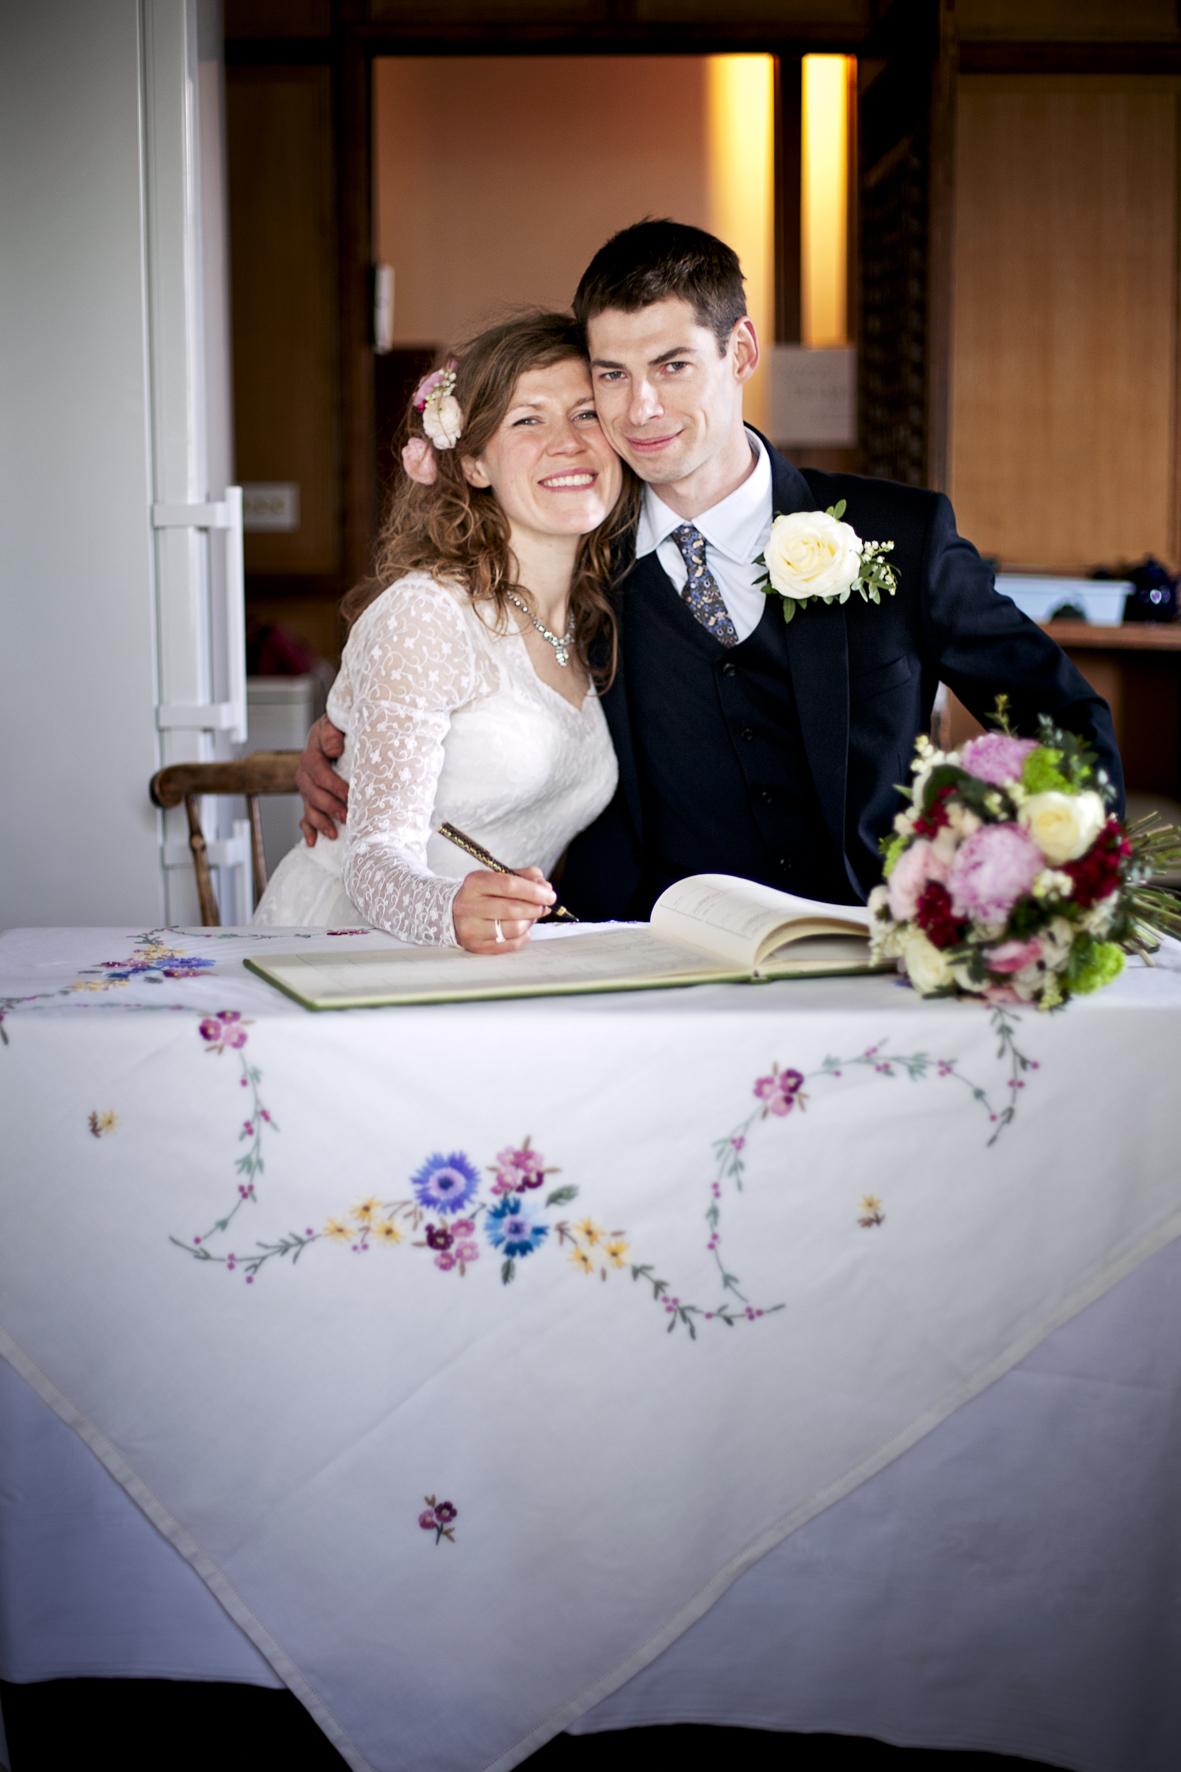 Wedding example_M&P__MG_3510-Edit_Claudia Leisinger.jpg